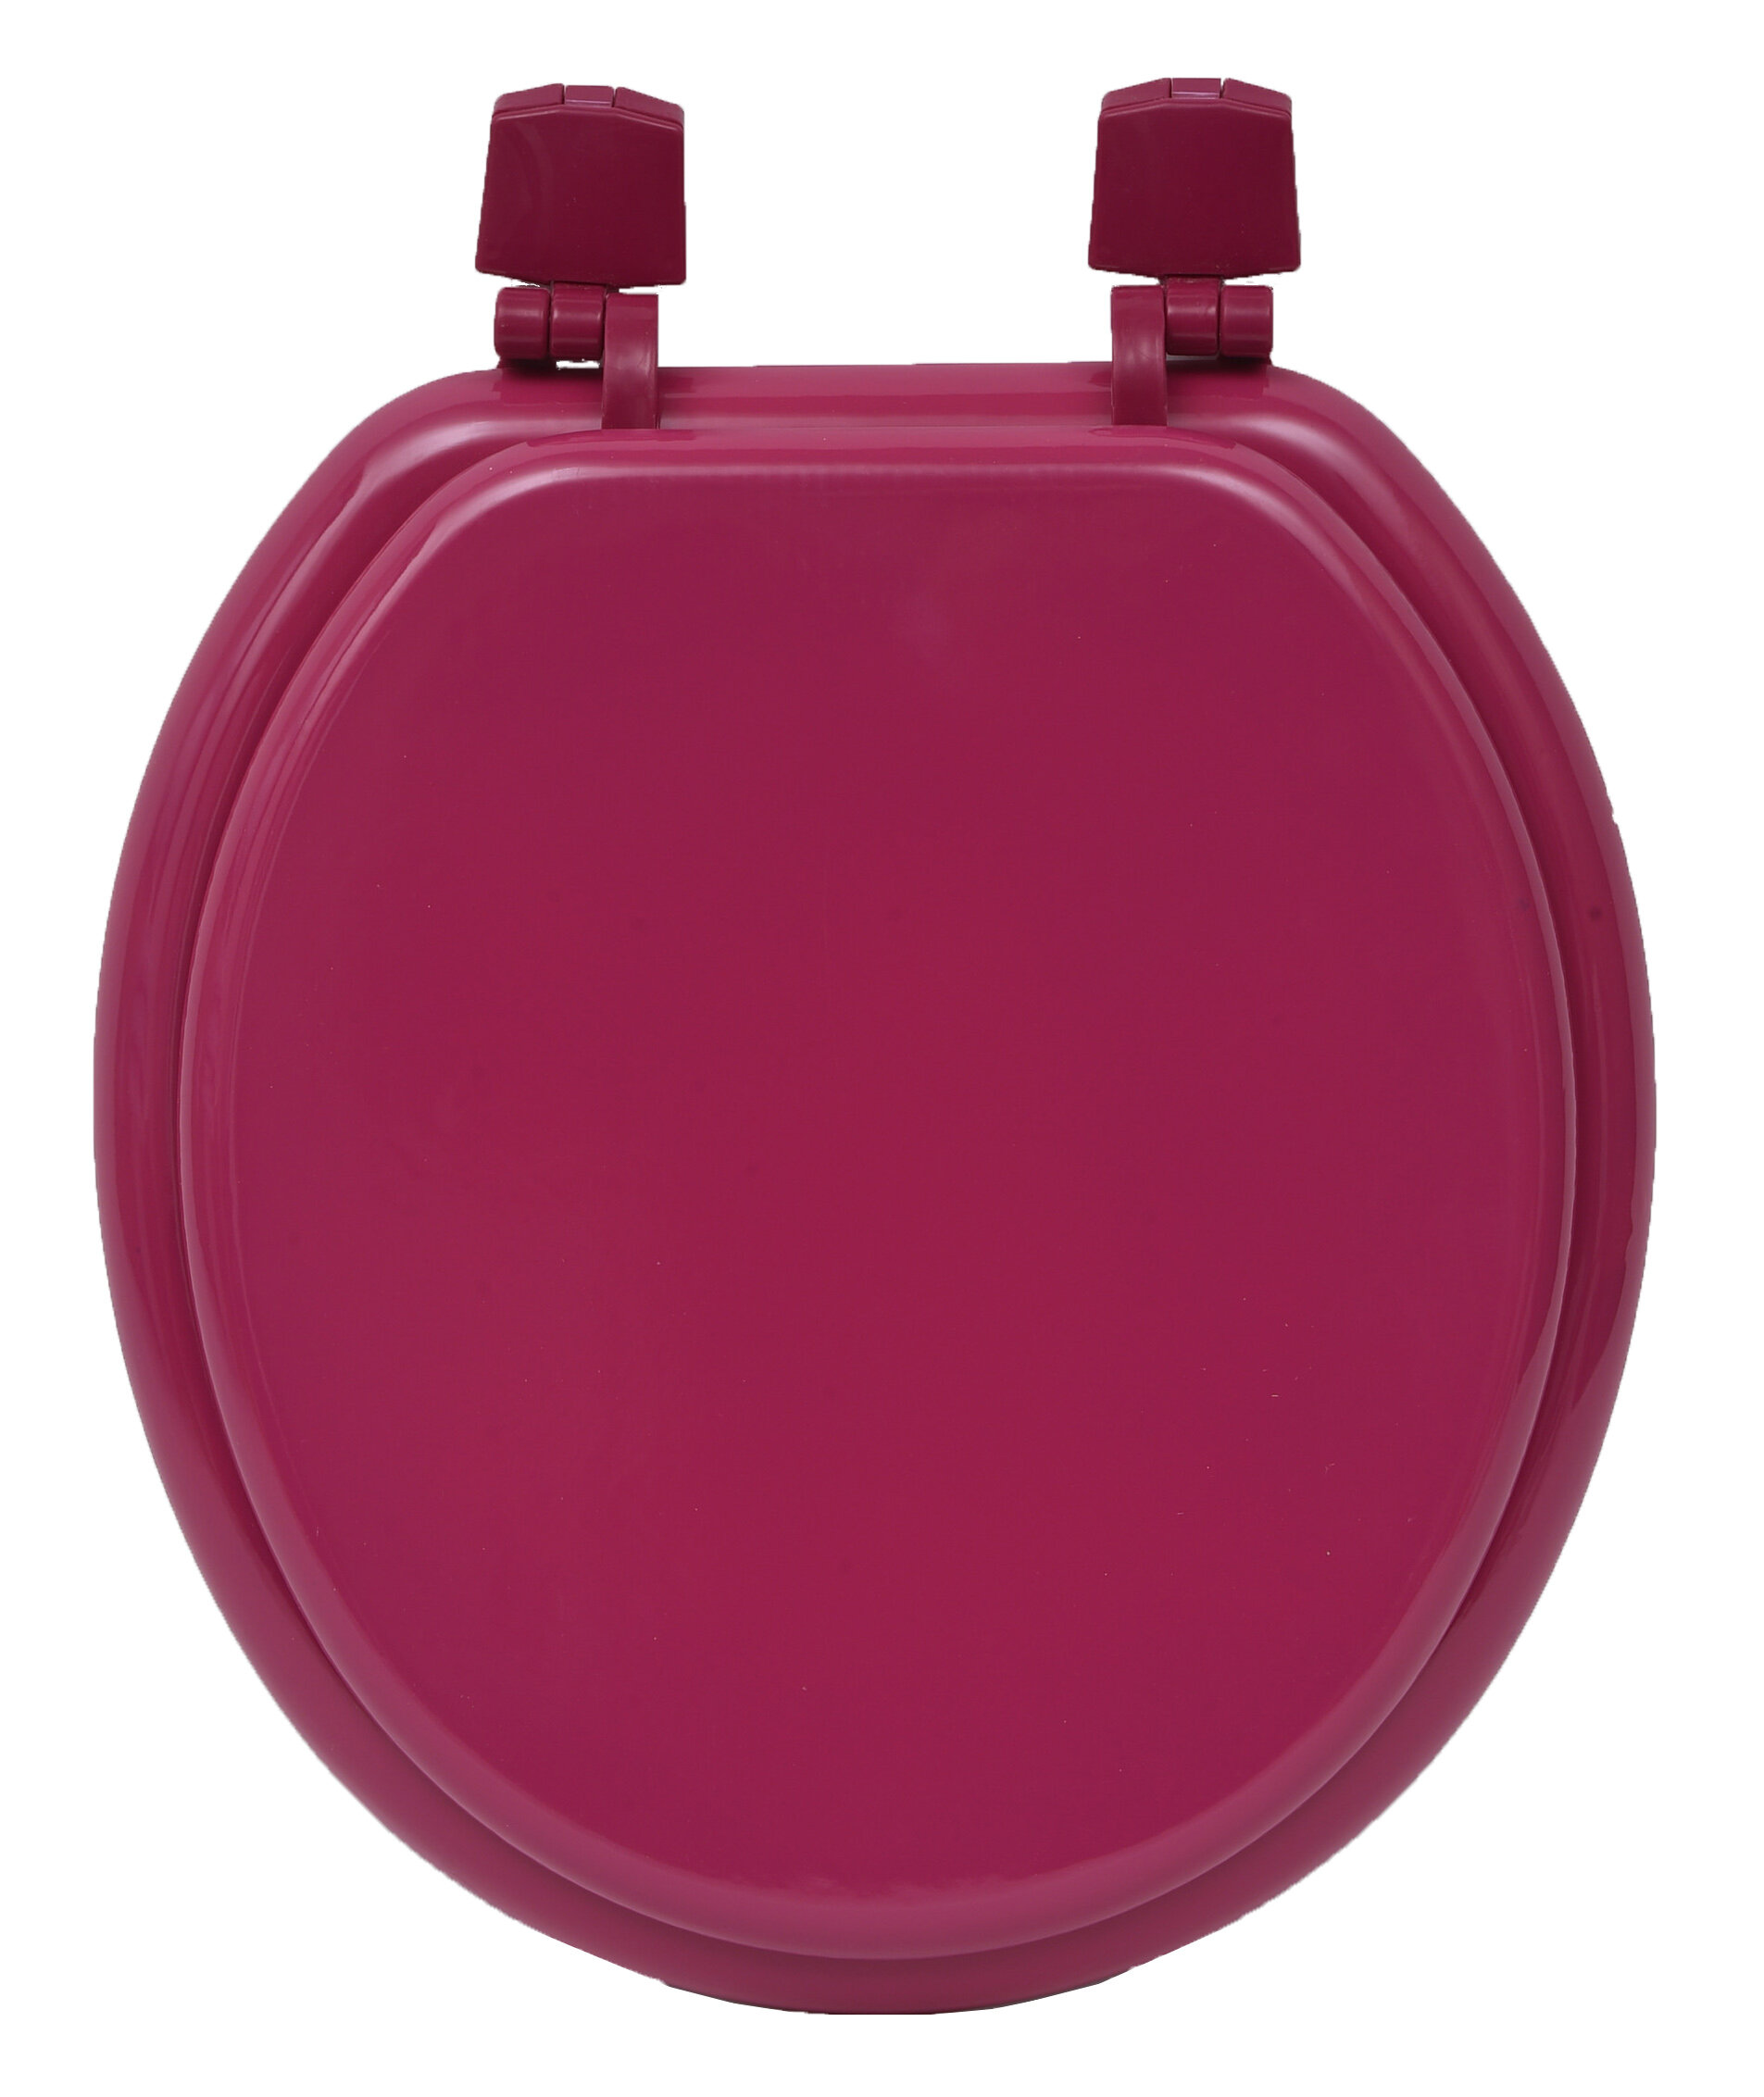 Phenomenal Round Molded Wood Toilet Seat Beatyapartments Chair Design Images Beatyapartmentscom